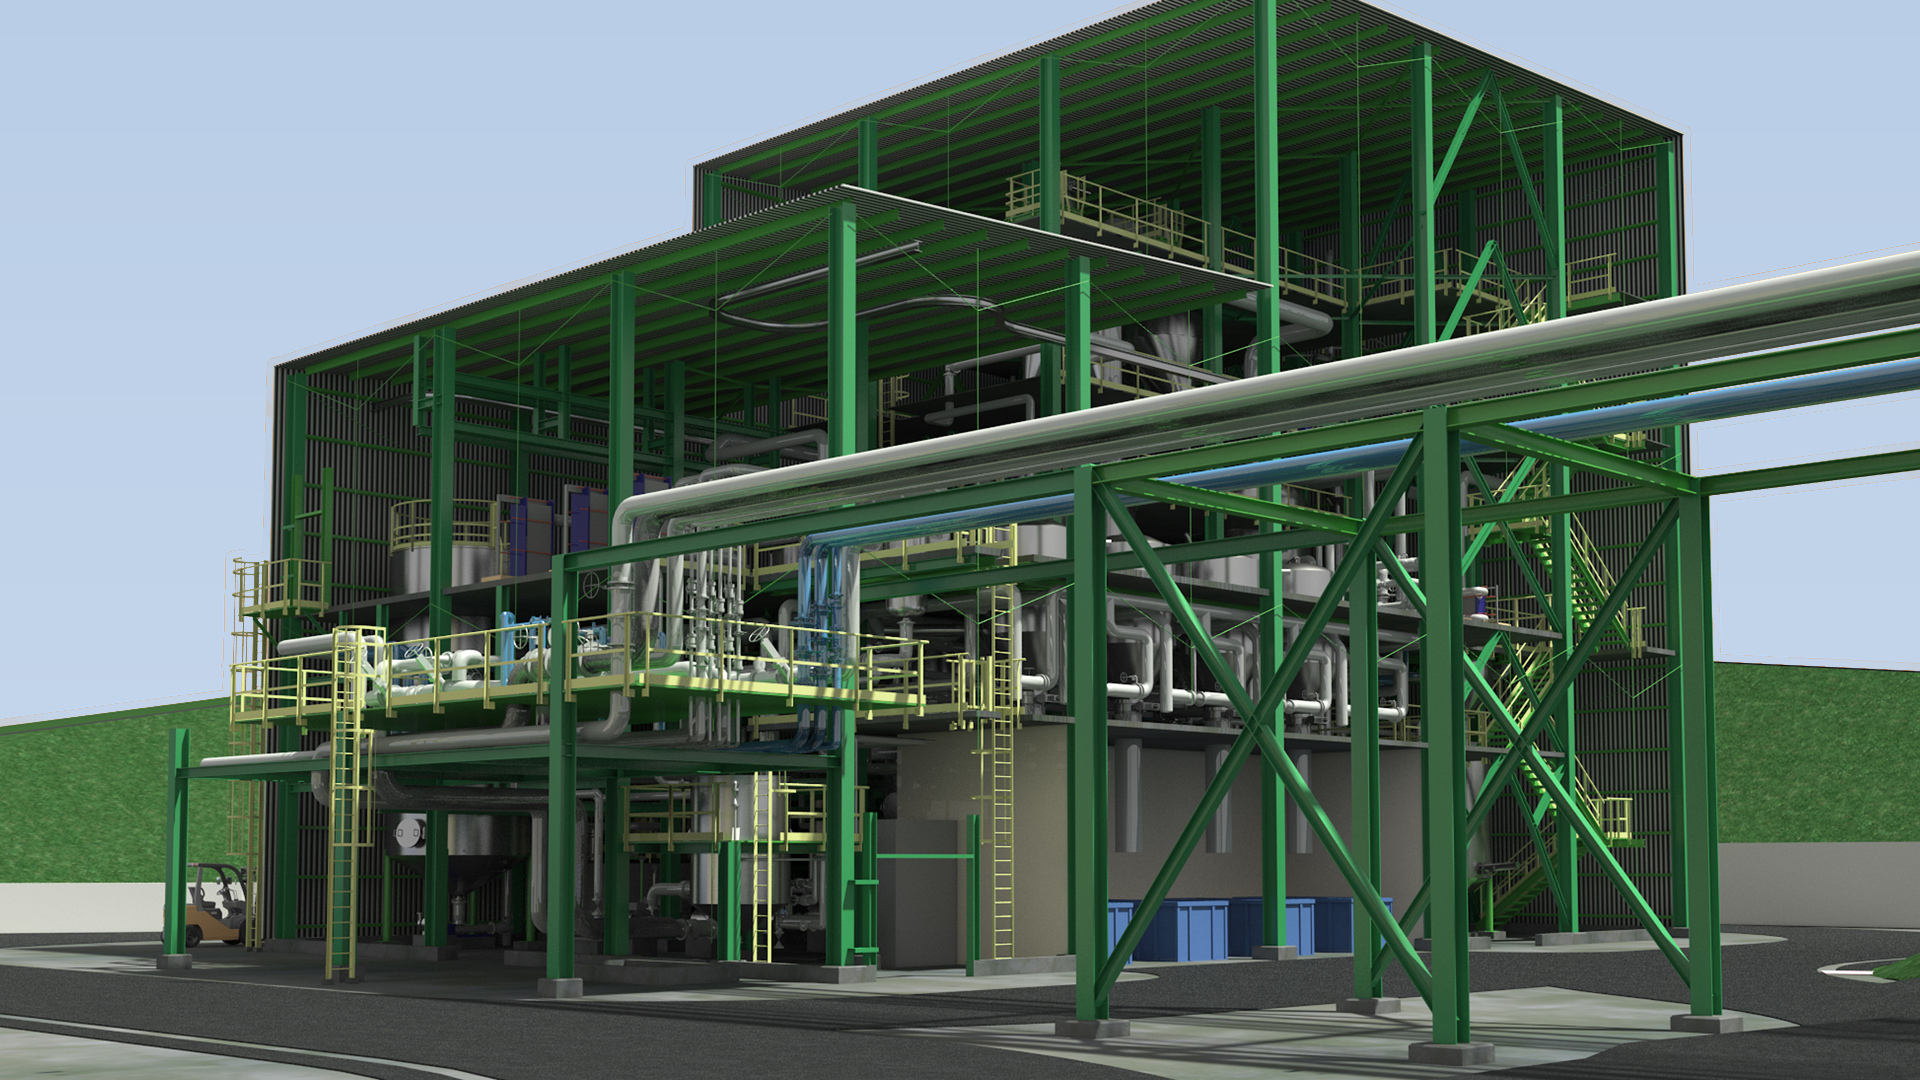 Render y Arquitectura 3D Industrial - GrupoAudiovisual 05